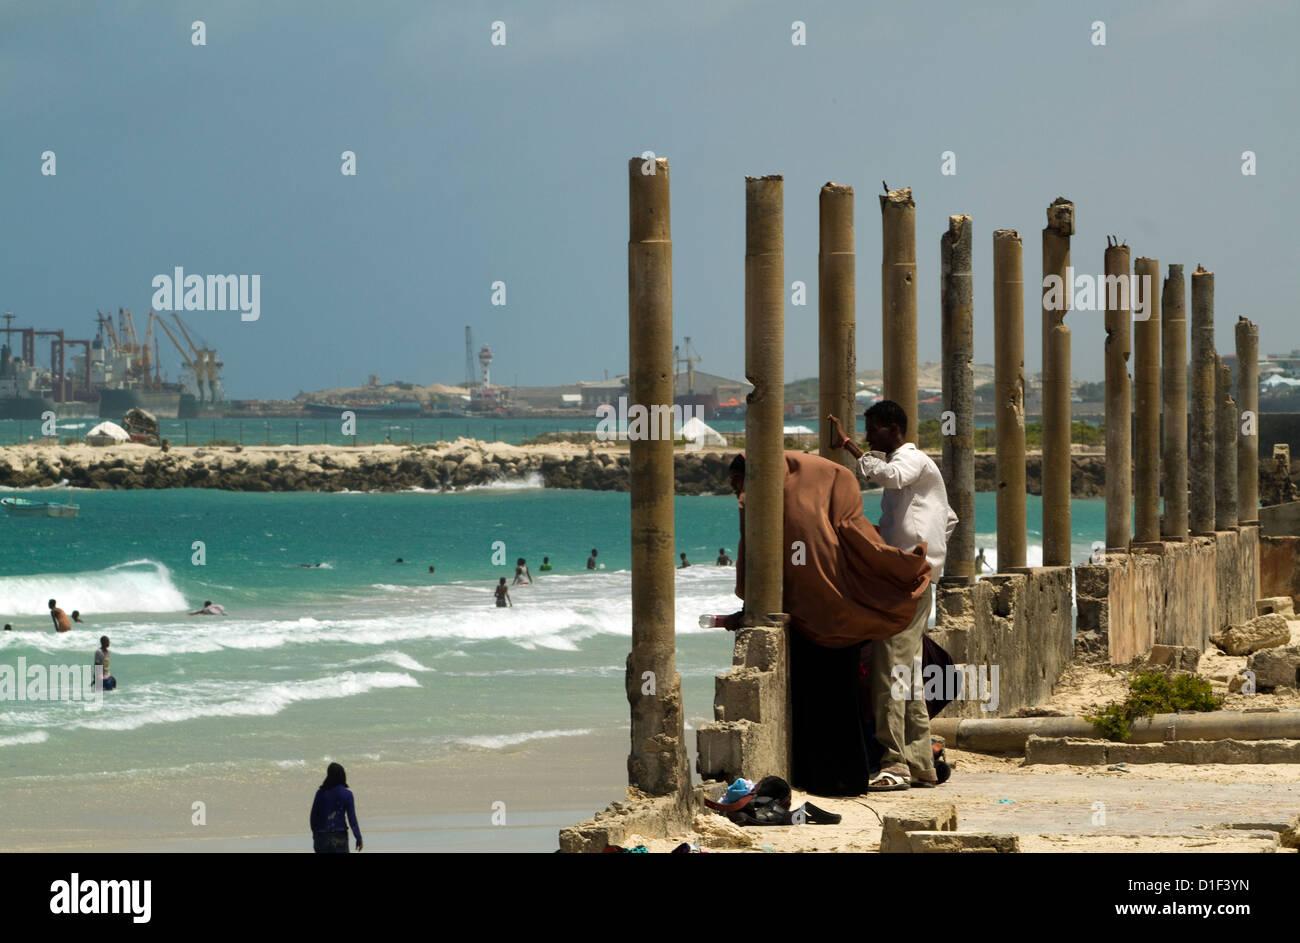 People at leisure activity on the beach Mogadishu Somalia - Stock Image